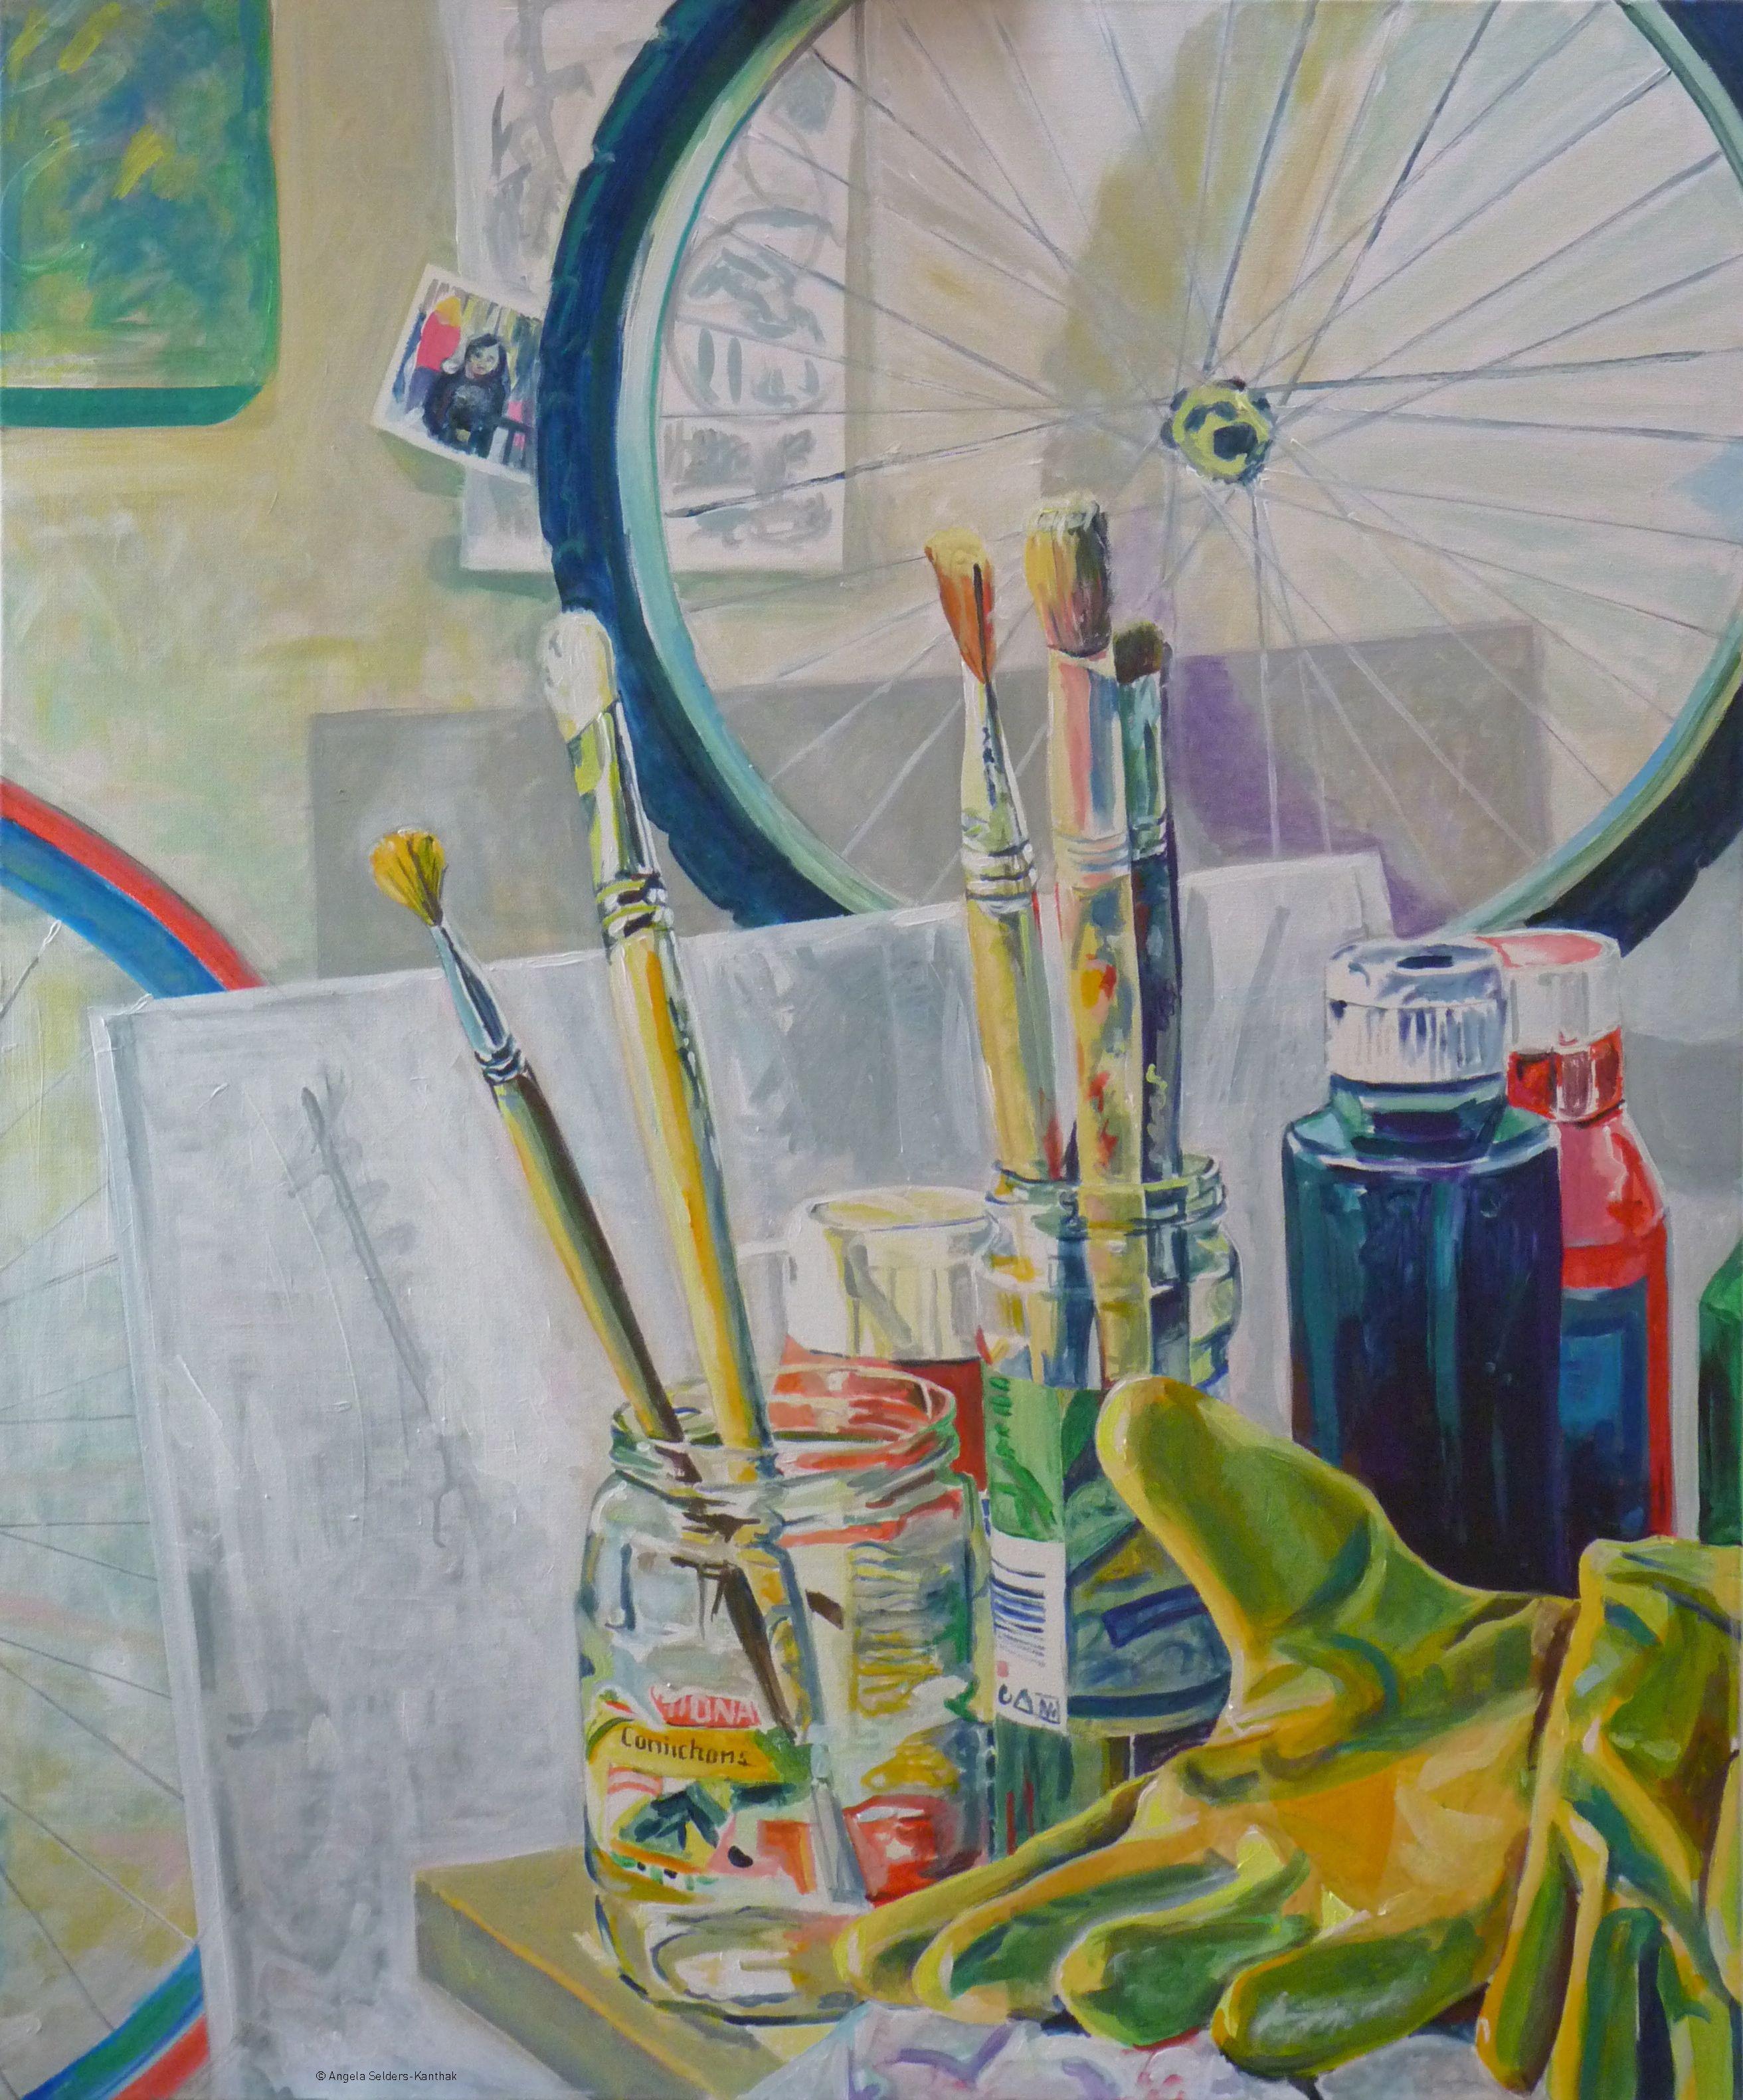 Werkstatt | Acryl auf Leinwand  100 x 120 cm | 2011